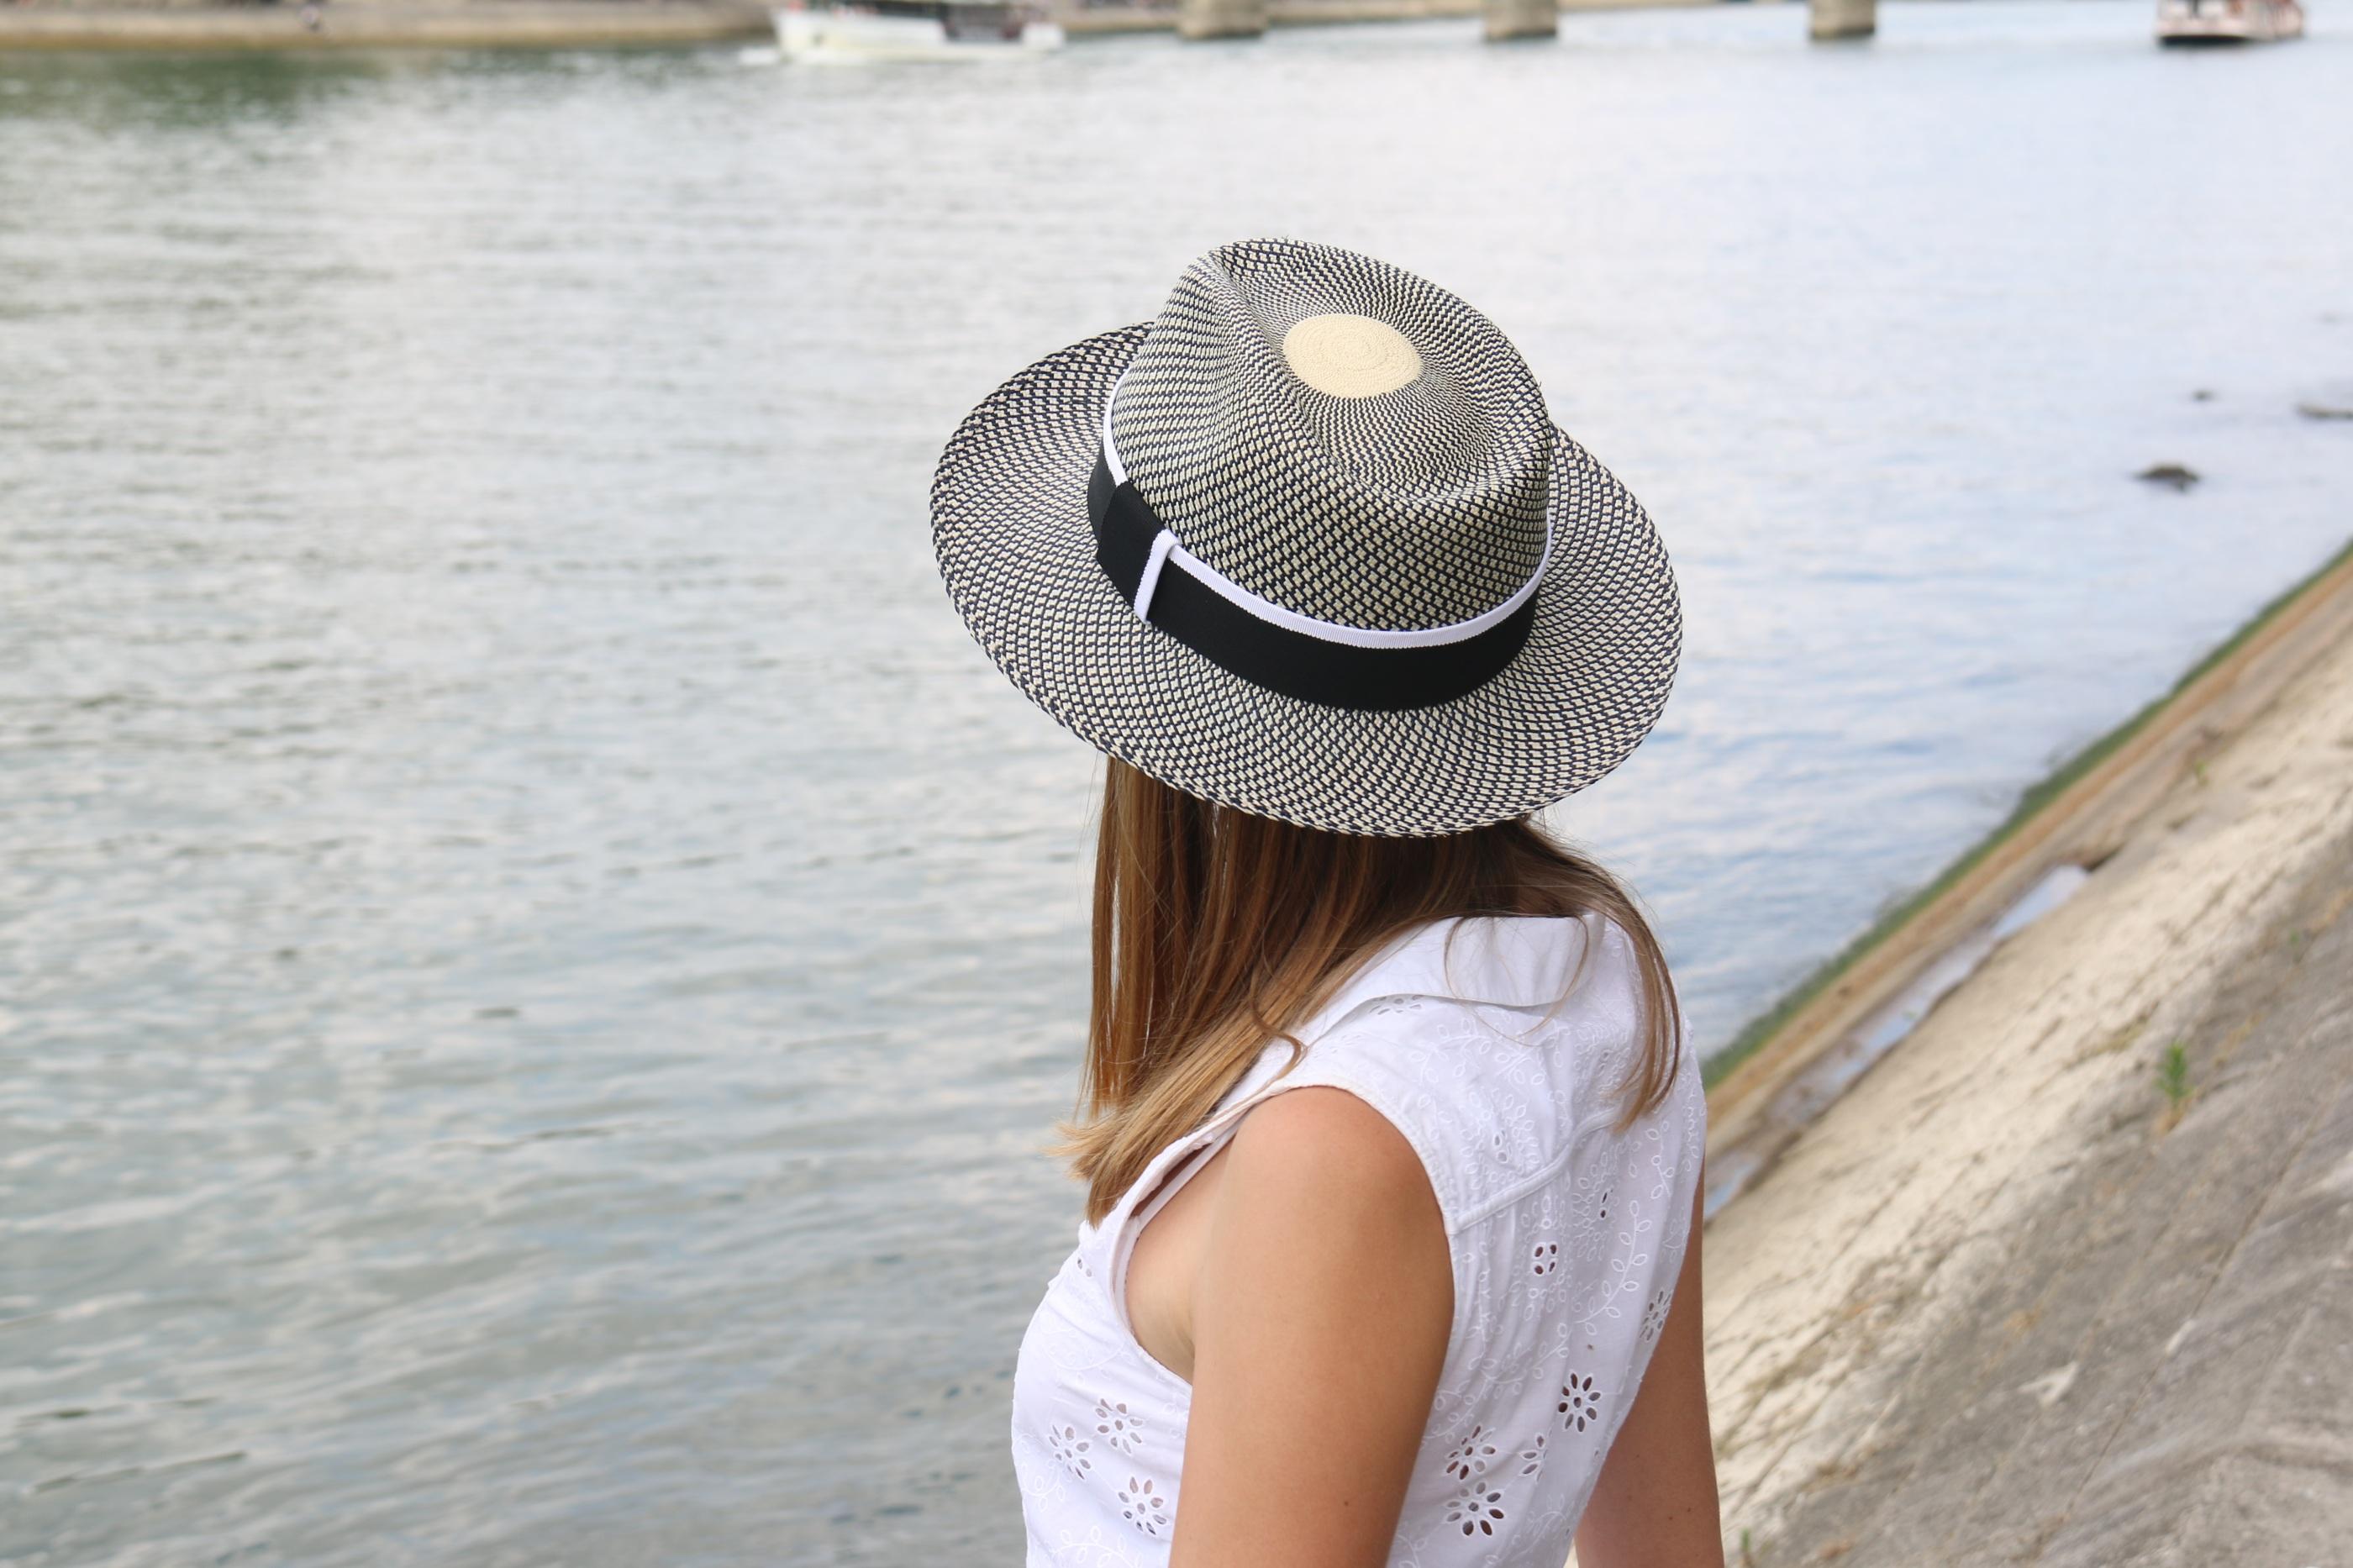 chapeau-panama-capferret-6-1800x1200